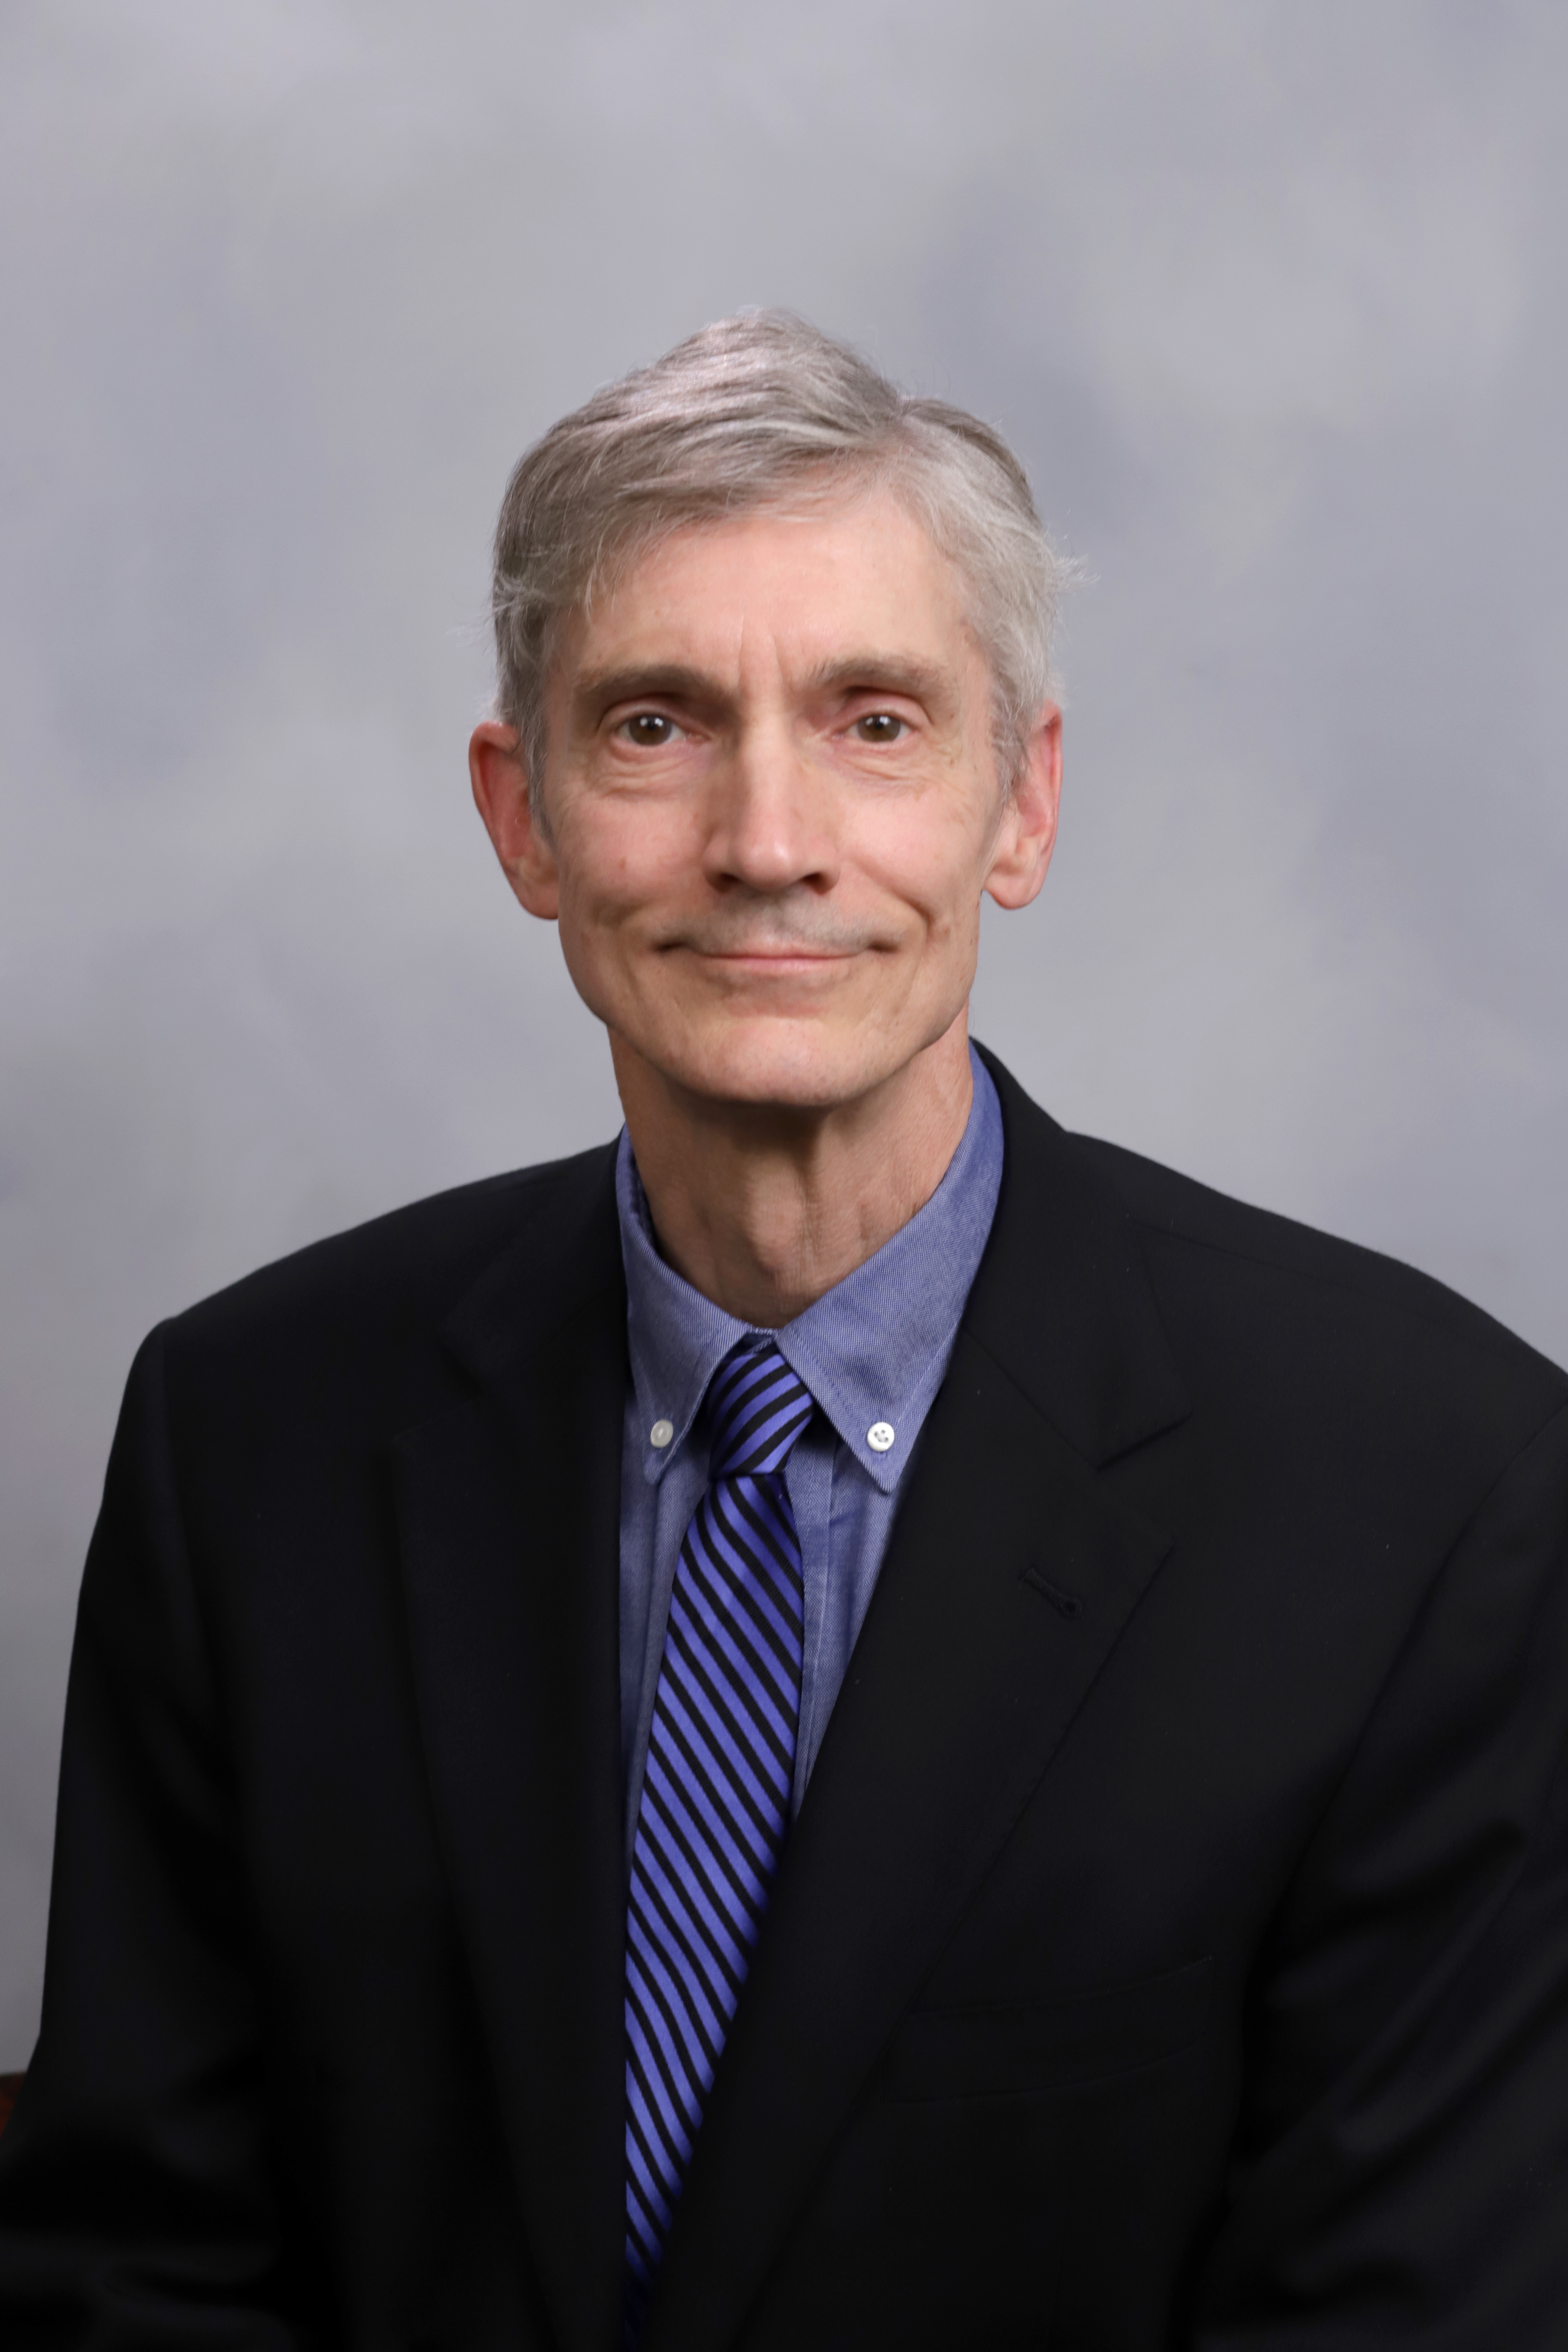 Joel S. Hasbrouck